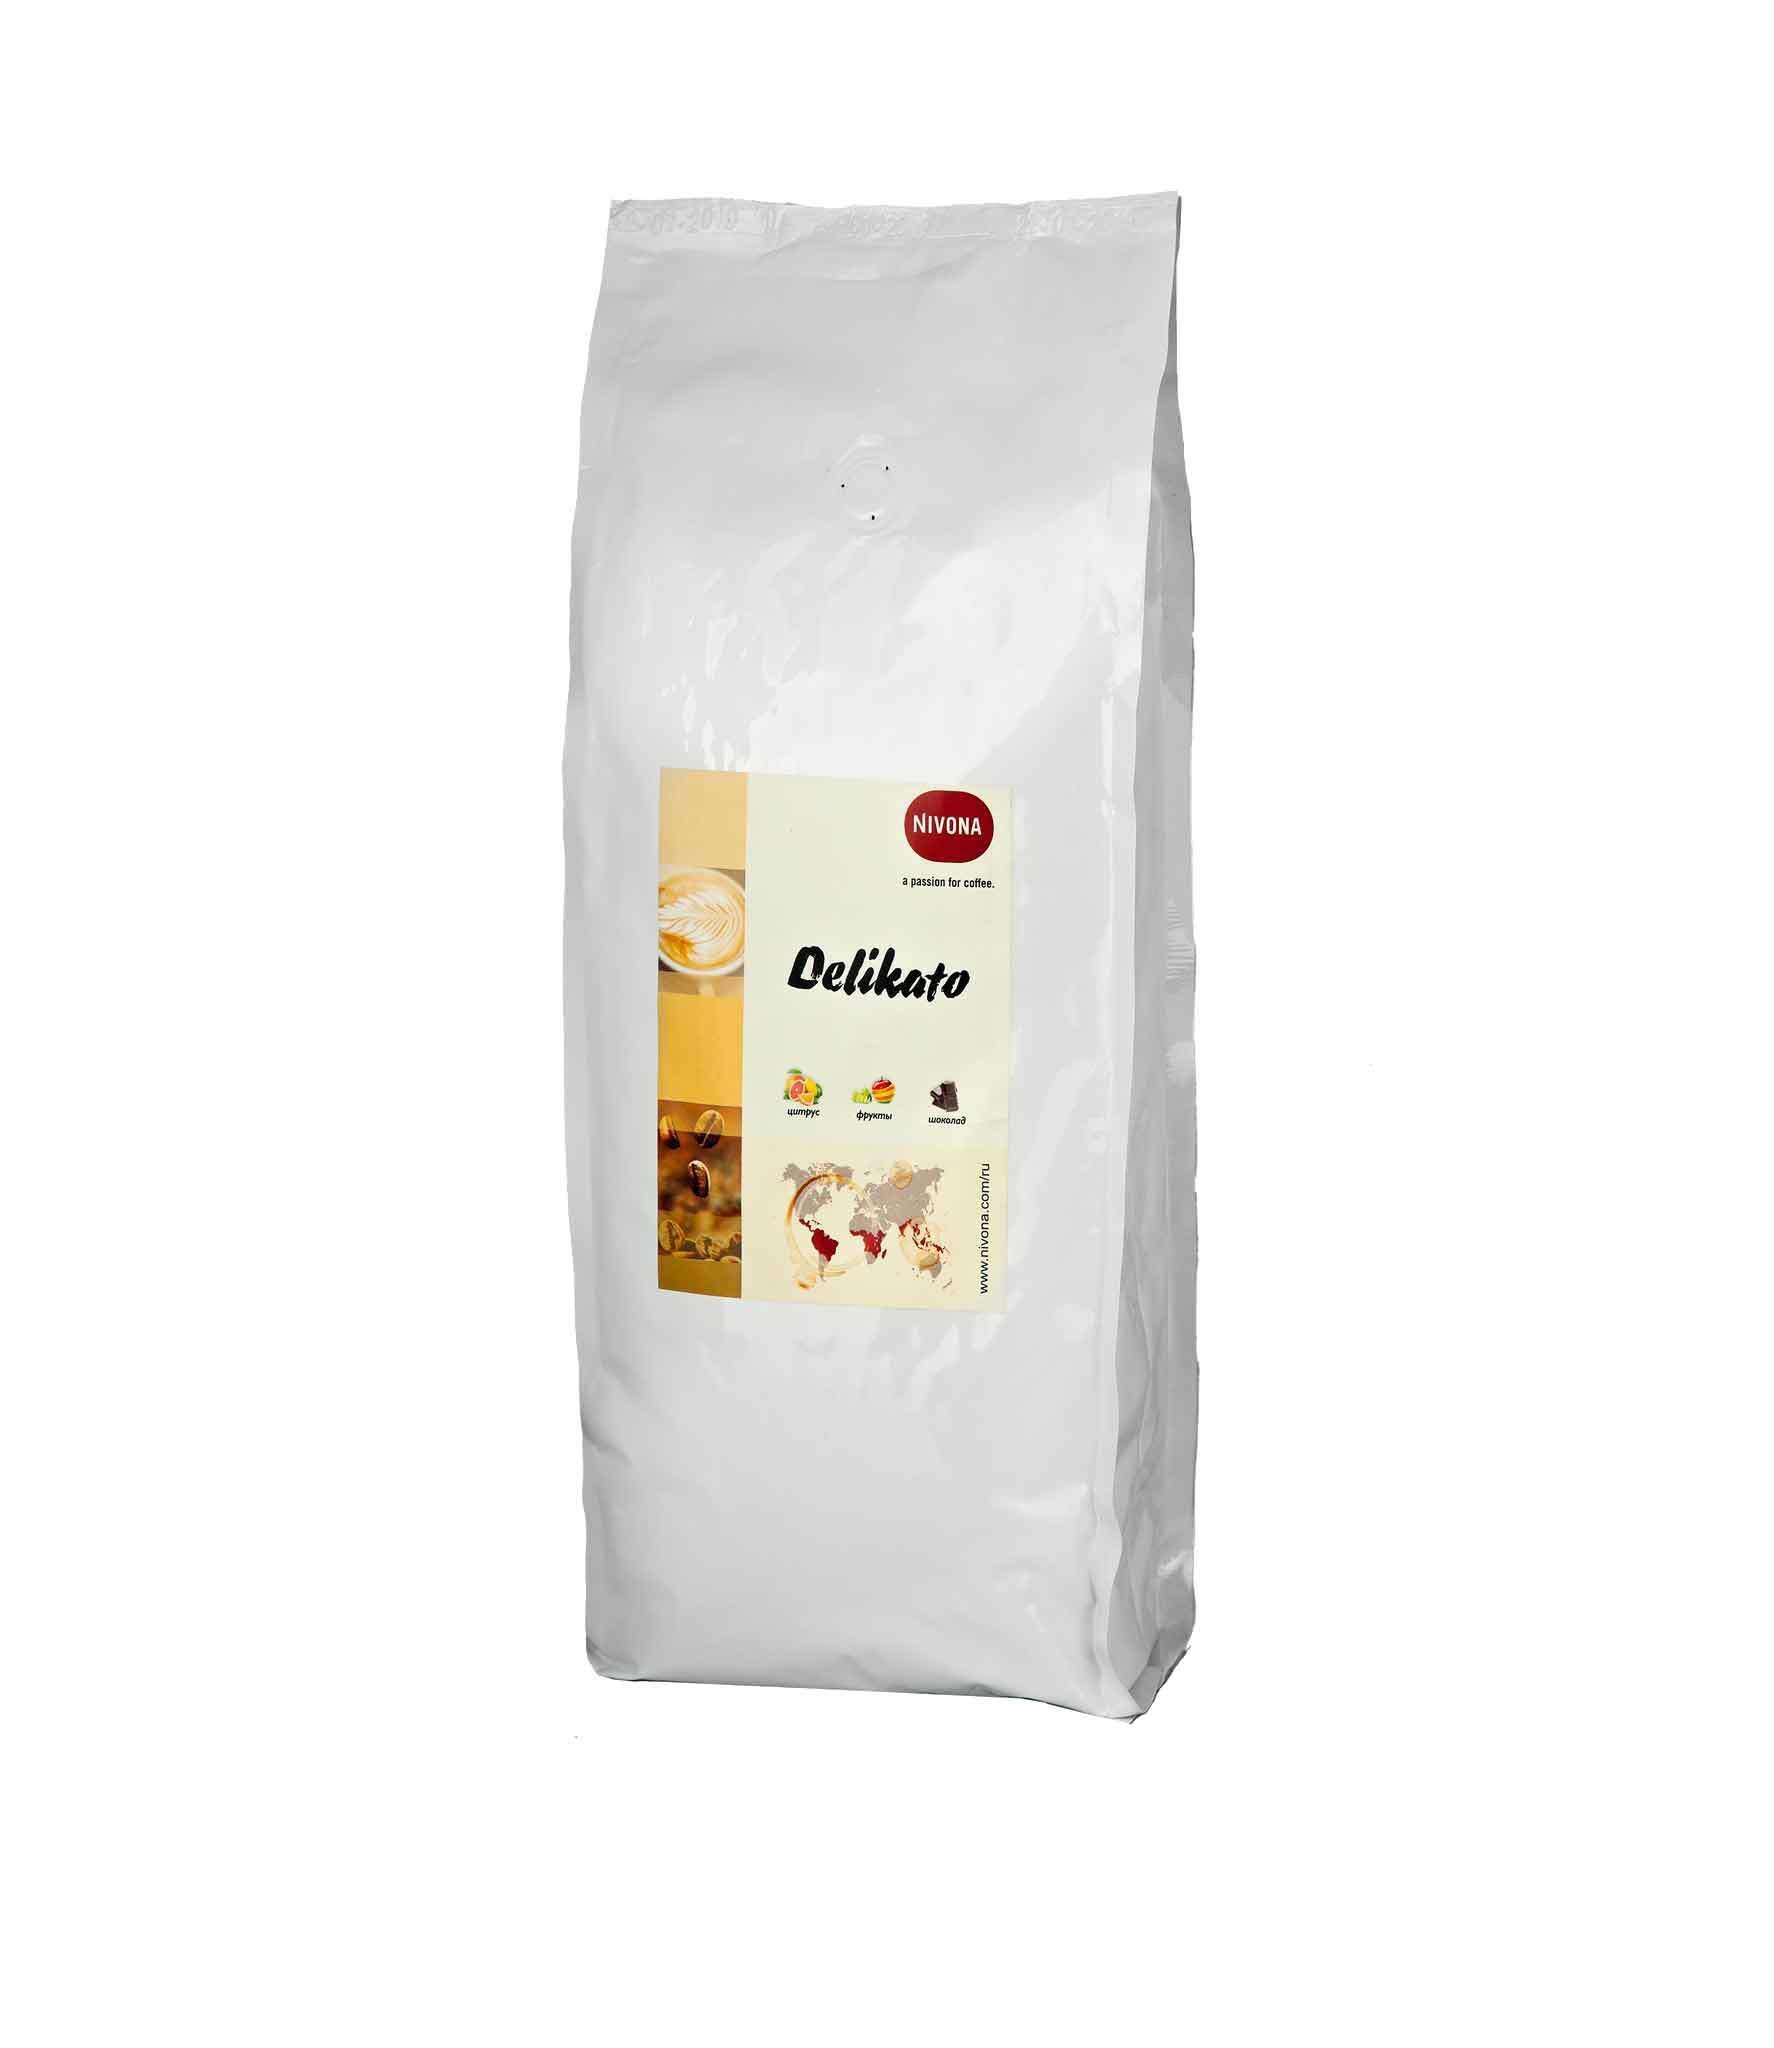 Кофе в зернах Nivona DELICATO, 1кг